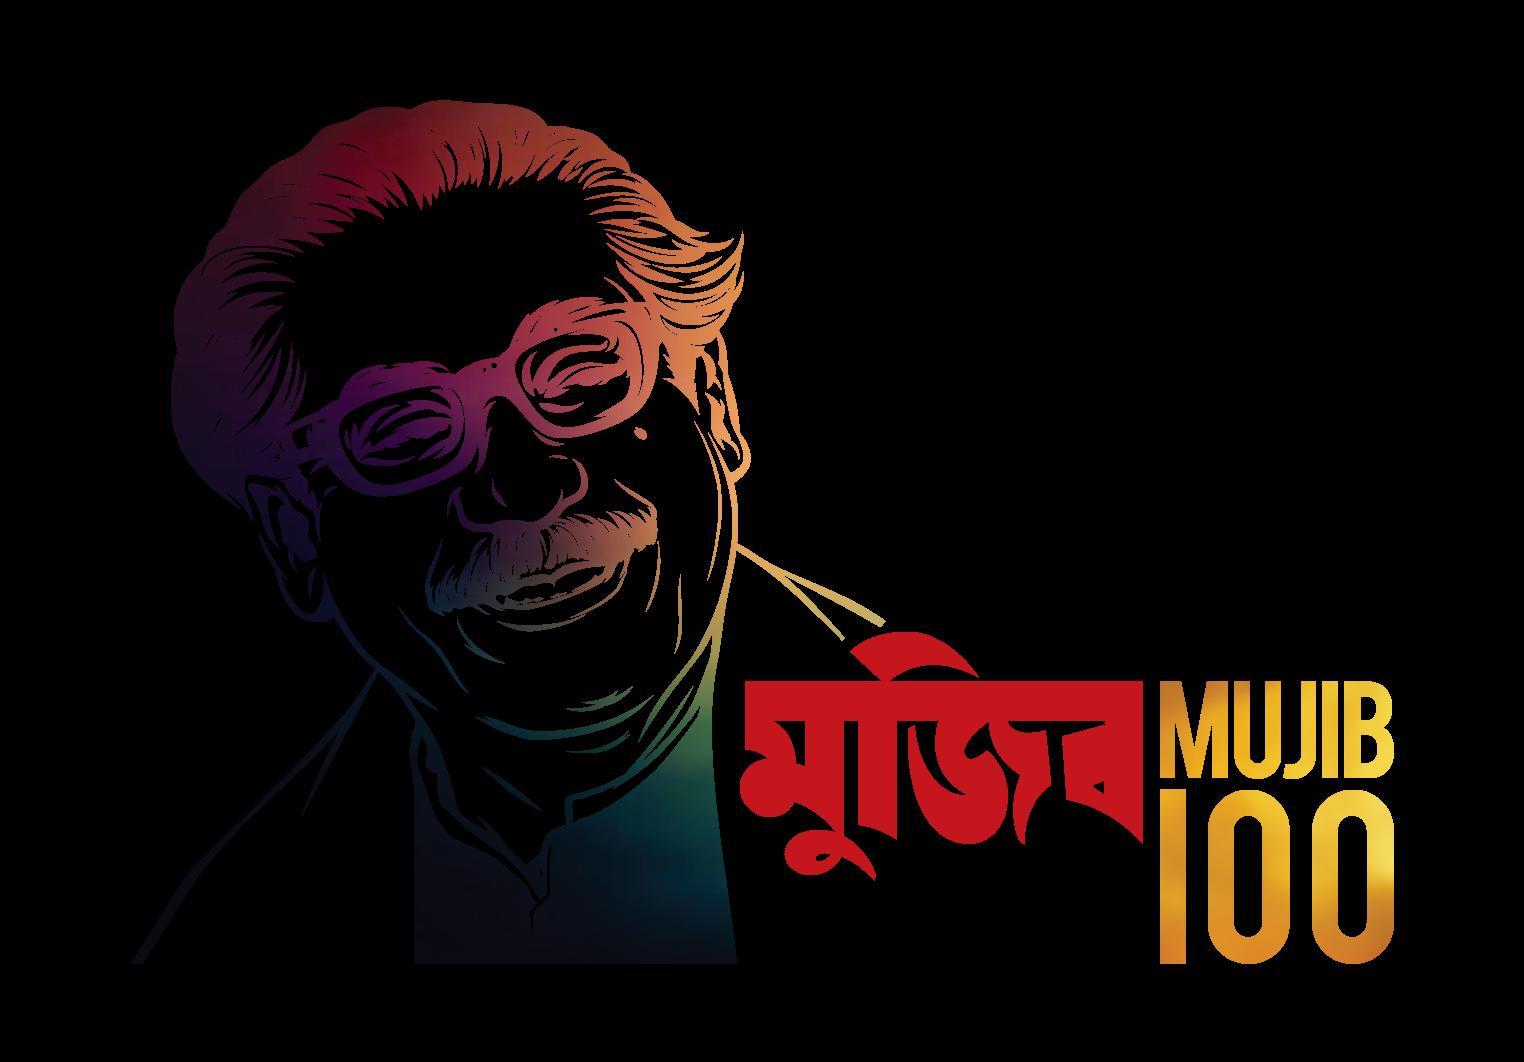 mujib100